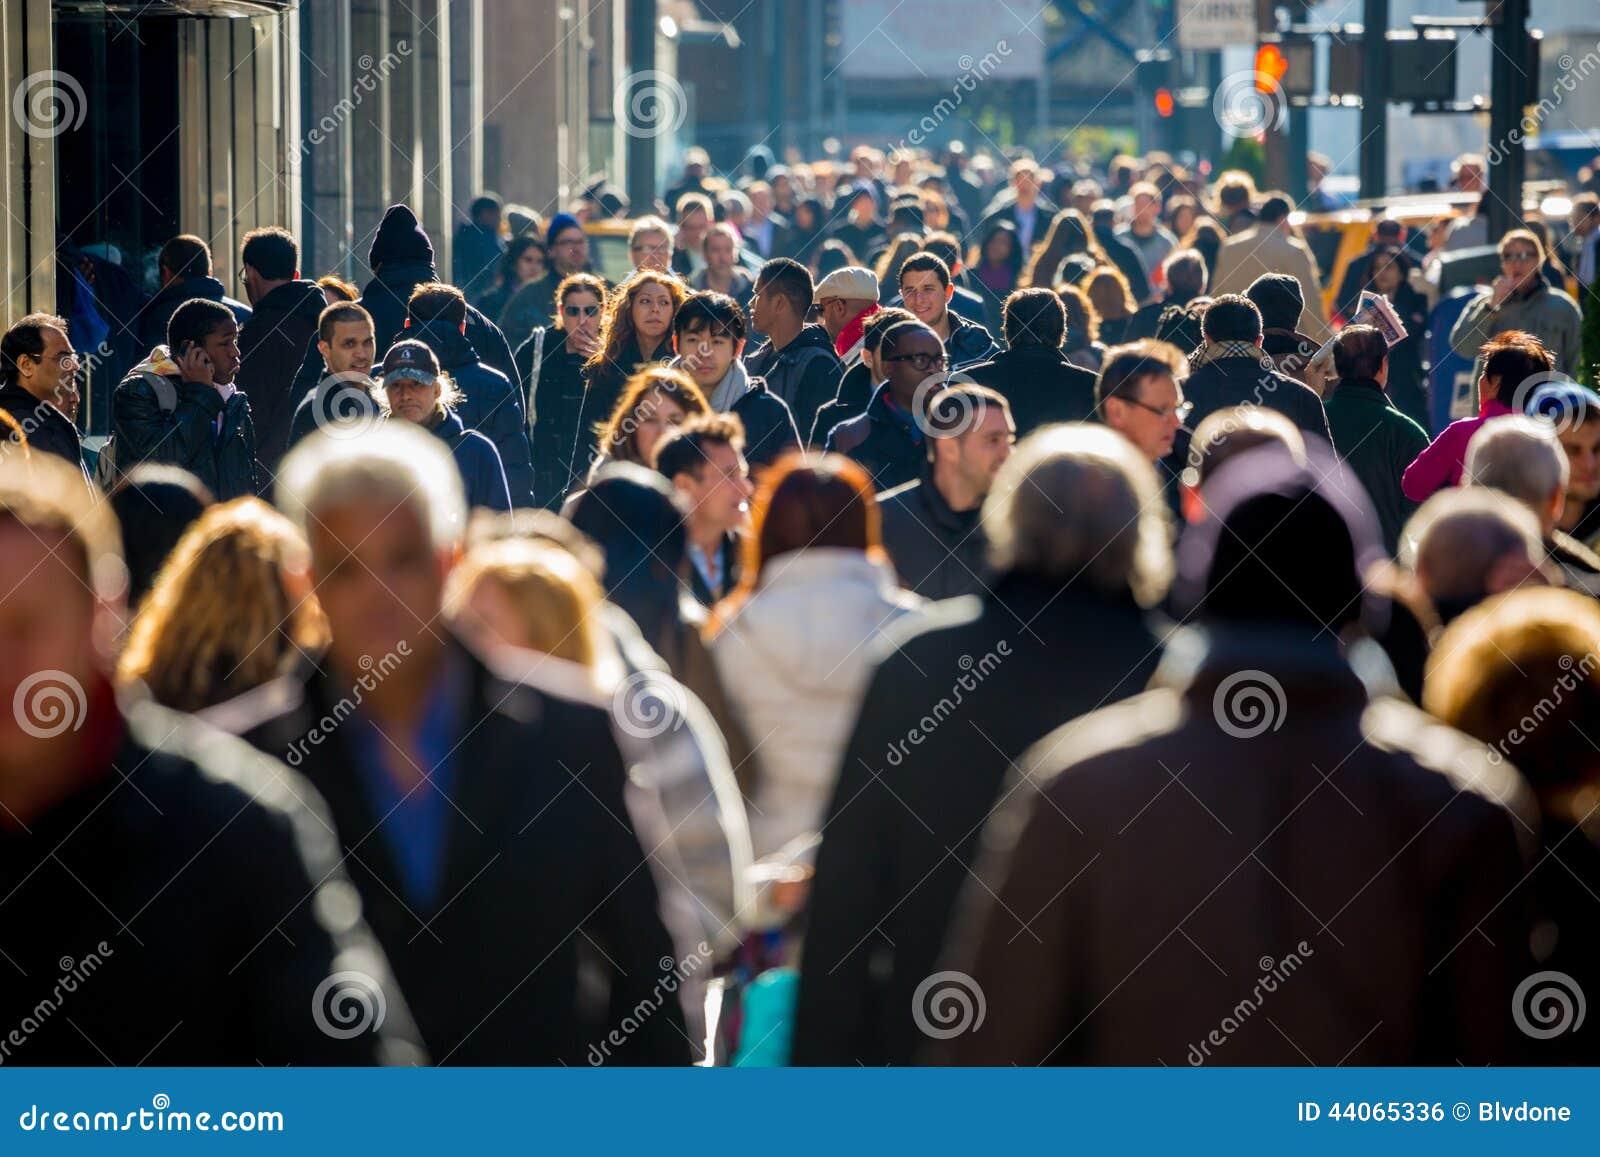 Crowd of people walking on street sidewalk